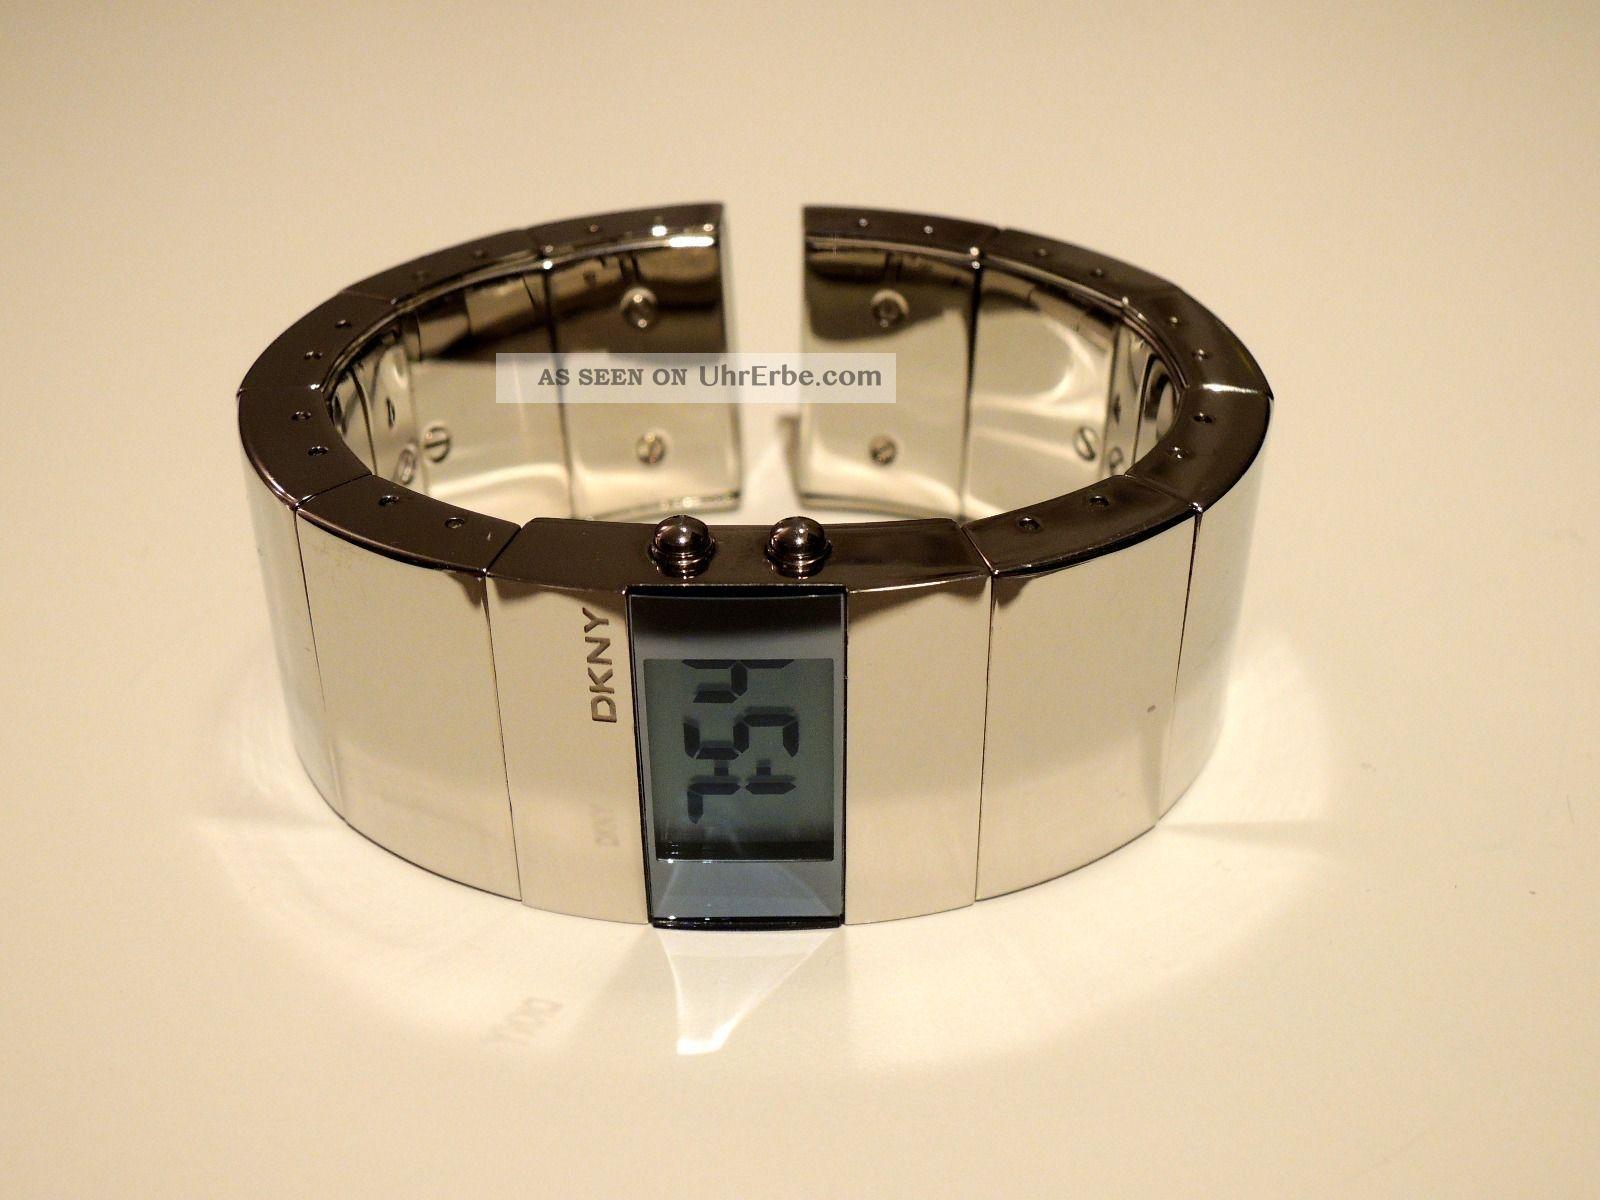 Dkny Damen Designer Armbanduhr Quarz Chrom Armbanduhren Bild